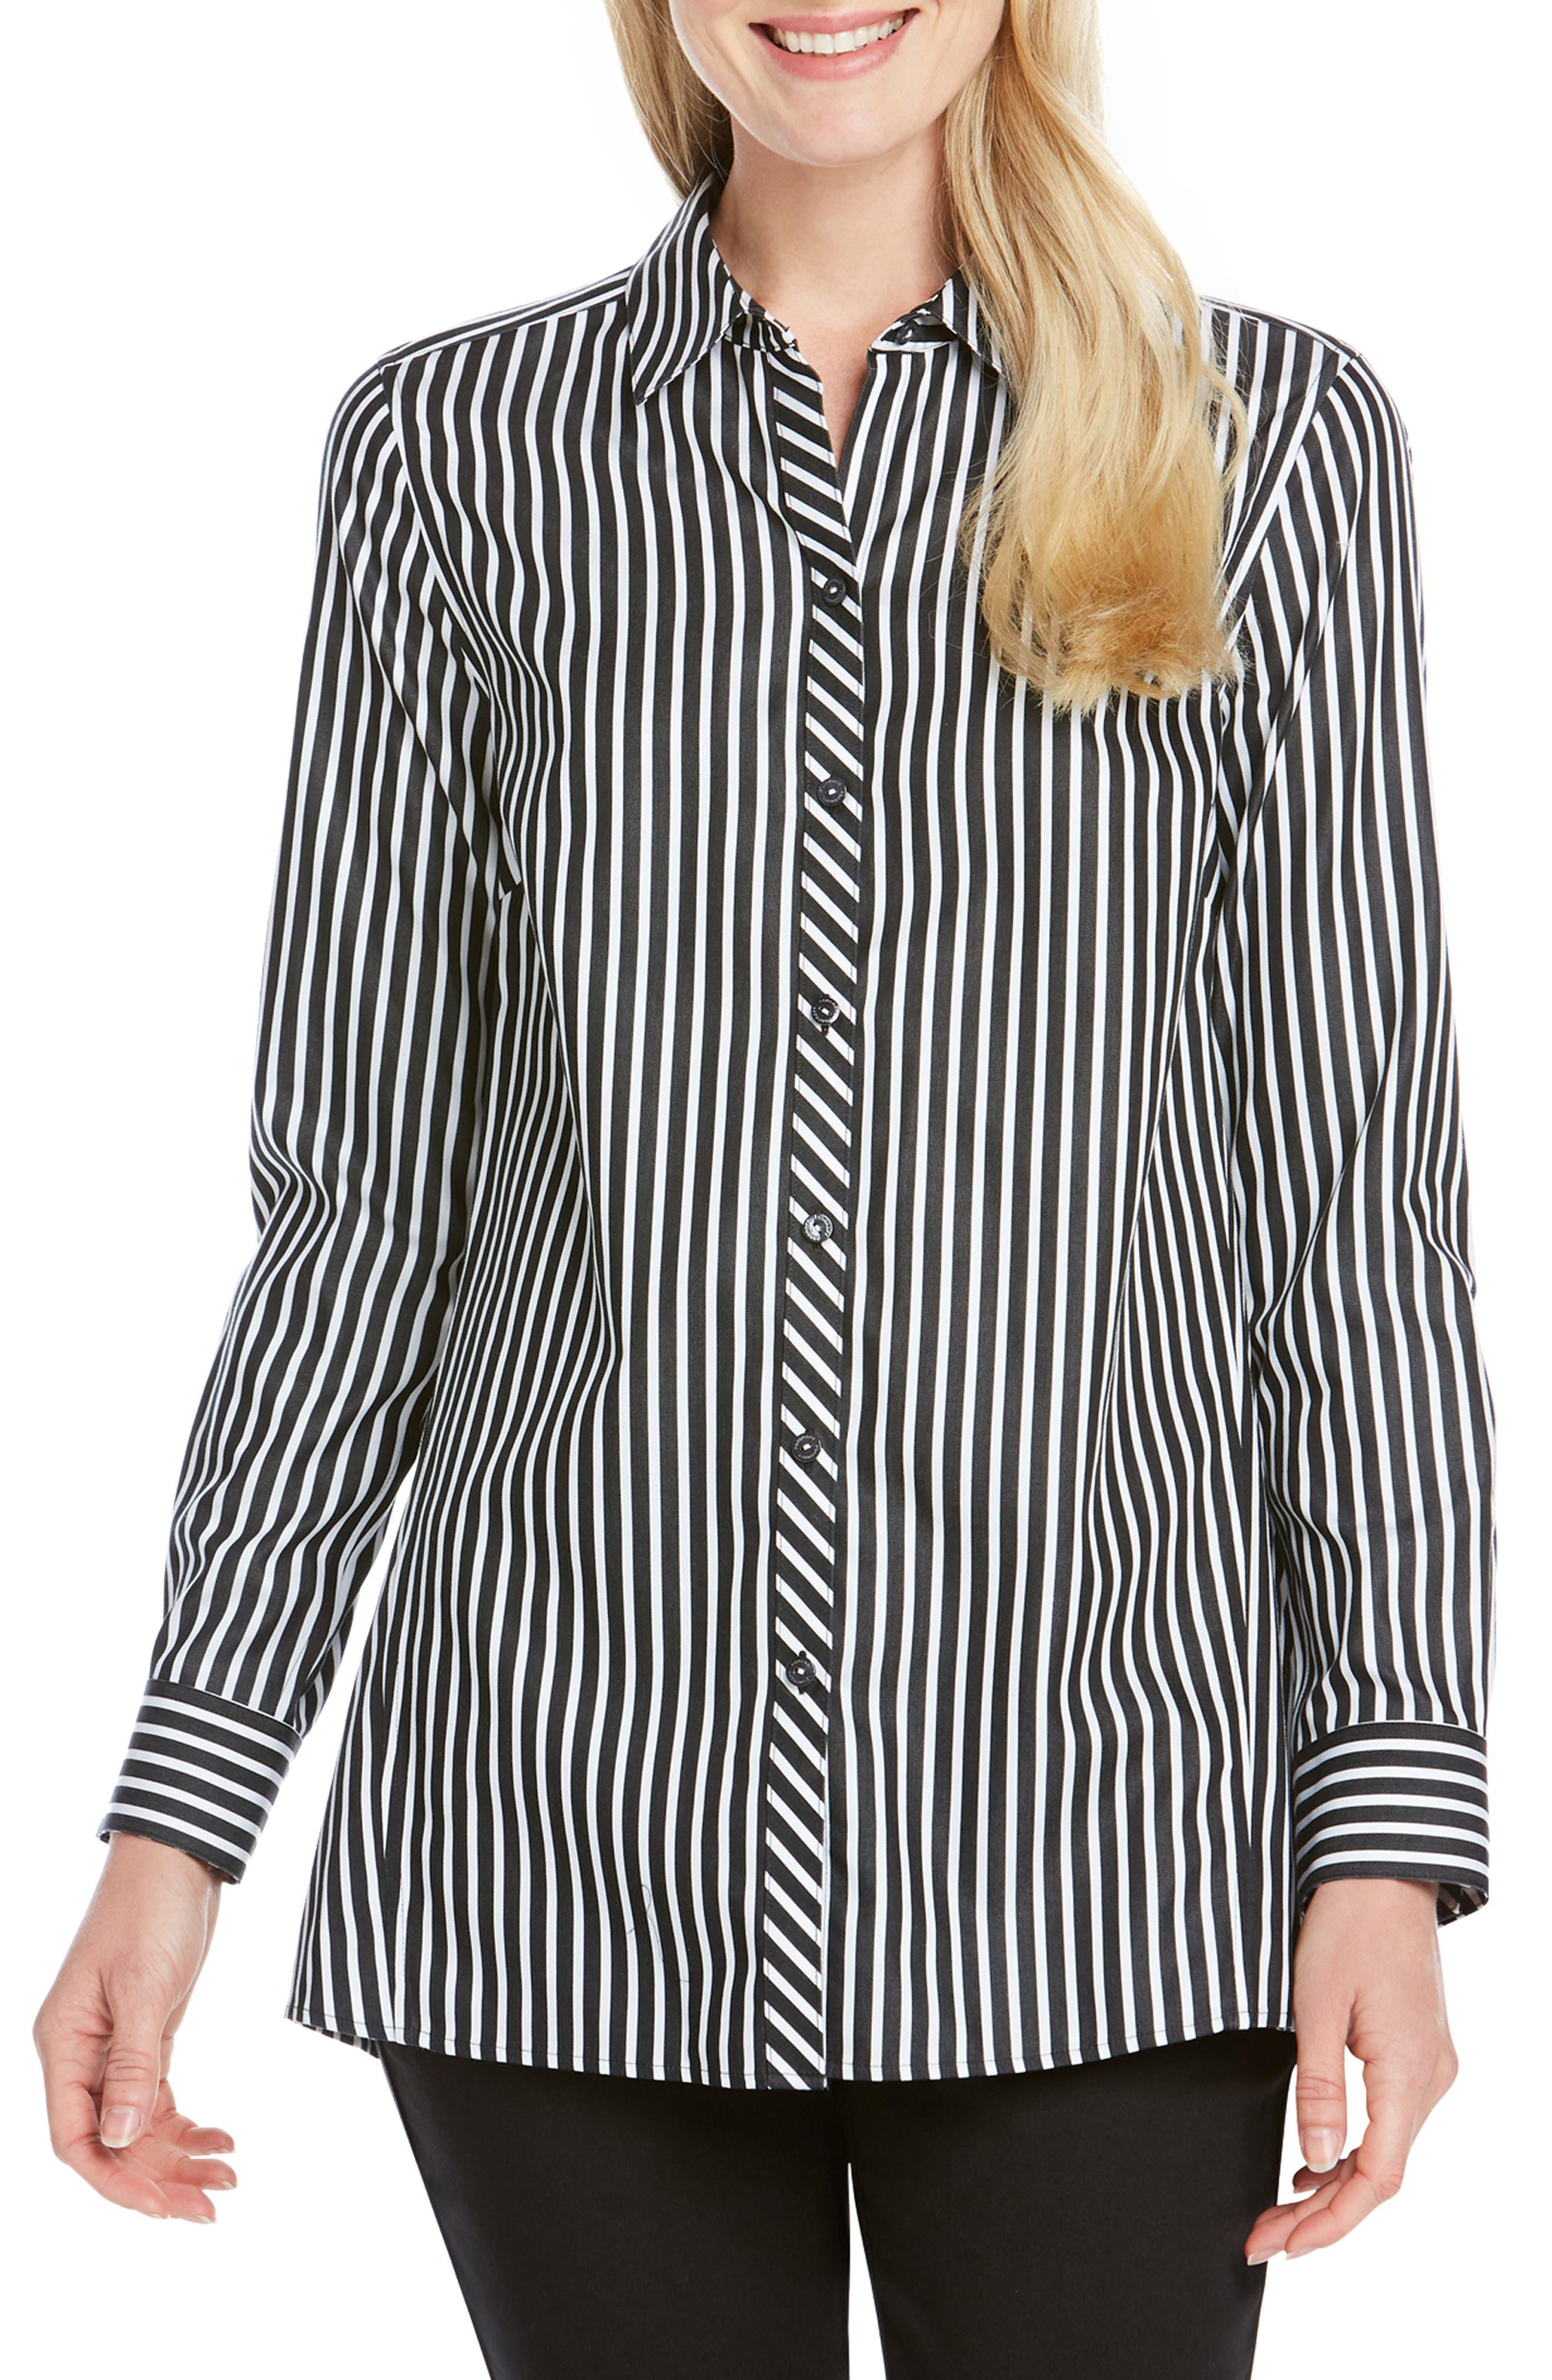 FOXCROFT Emilia Striped Cotton Tunic Shirt in Black/ White